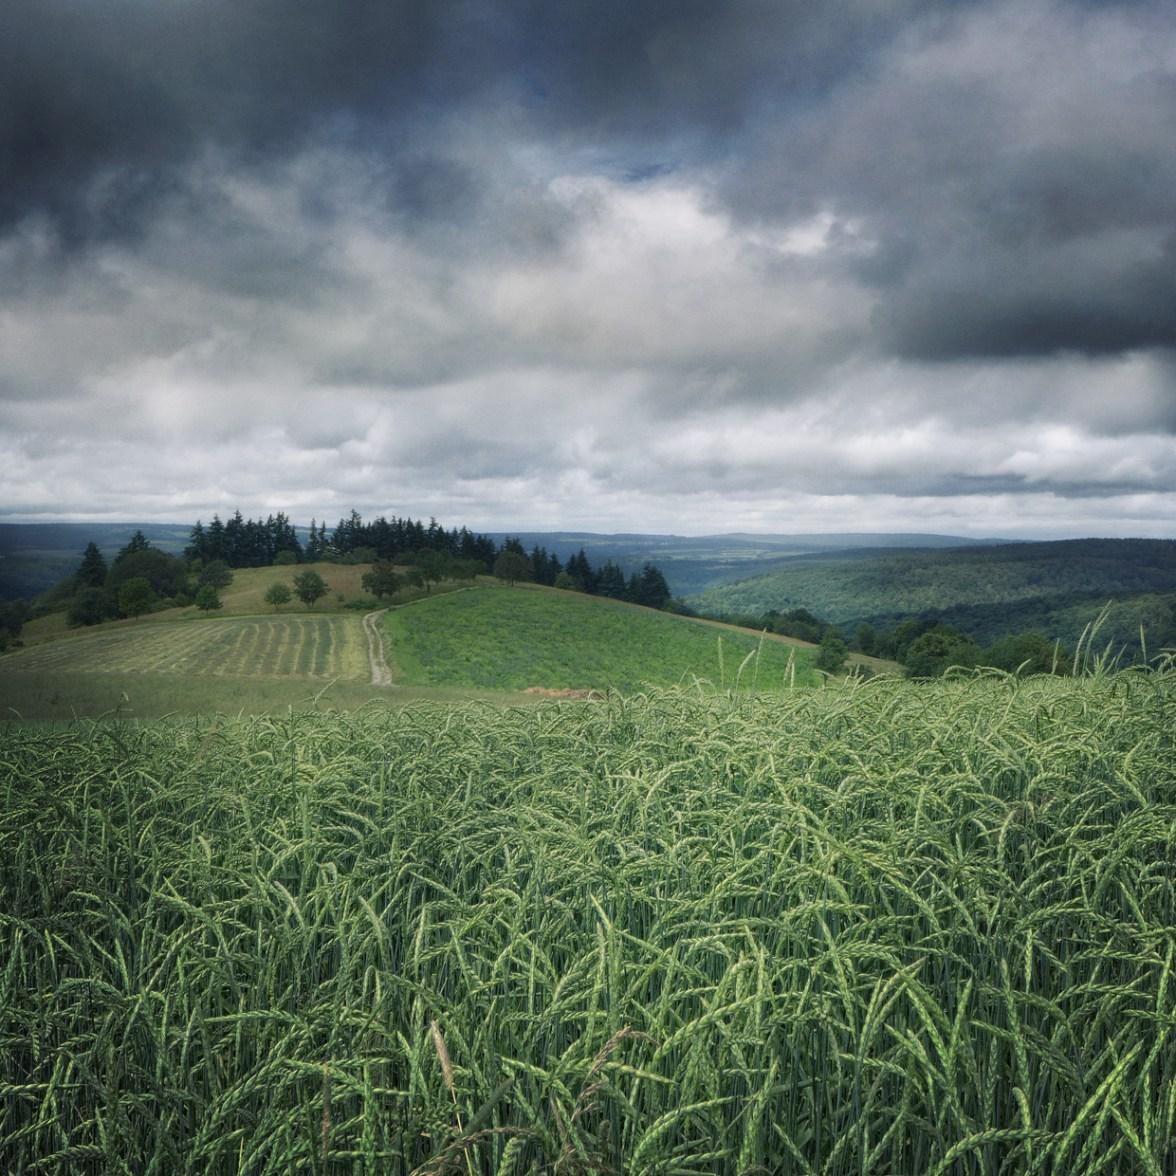 Leaving the Valley Behind © Bernd Webler